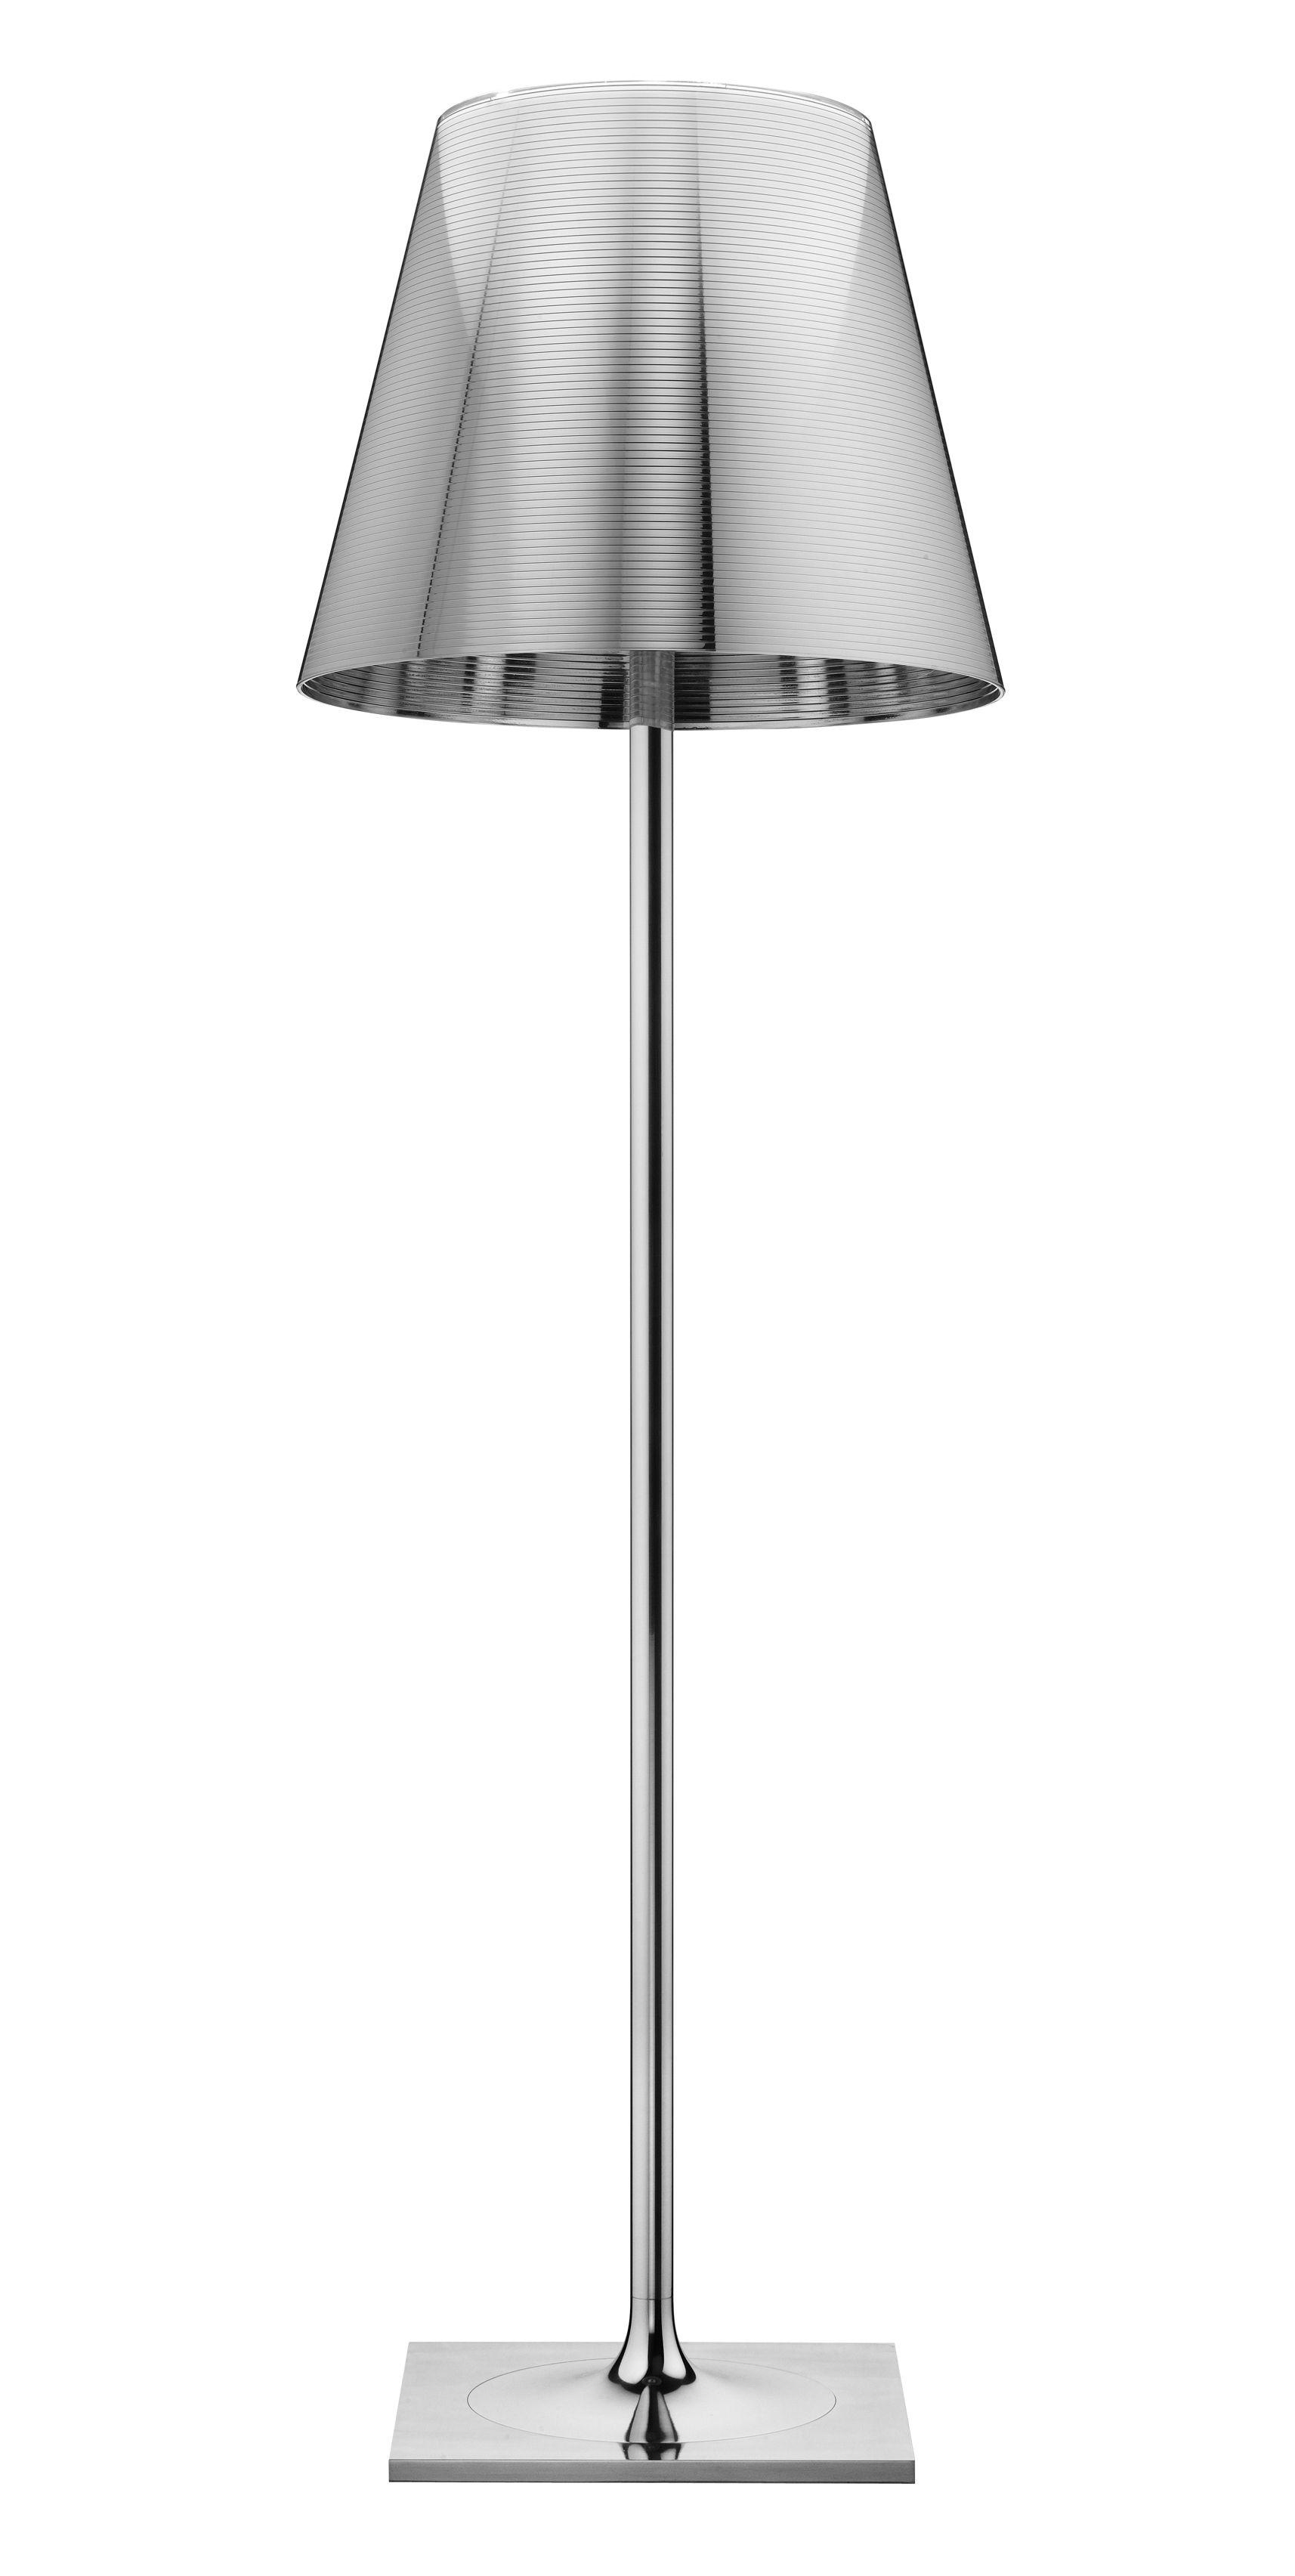 lampadaire ktribe f3 h 183 cm - flos